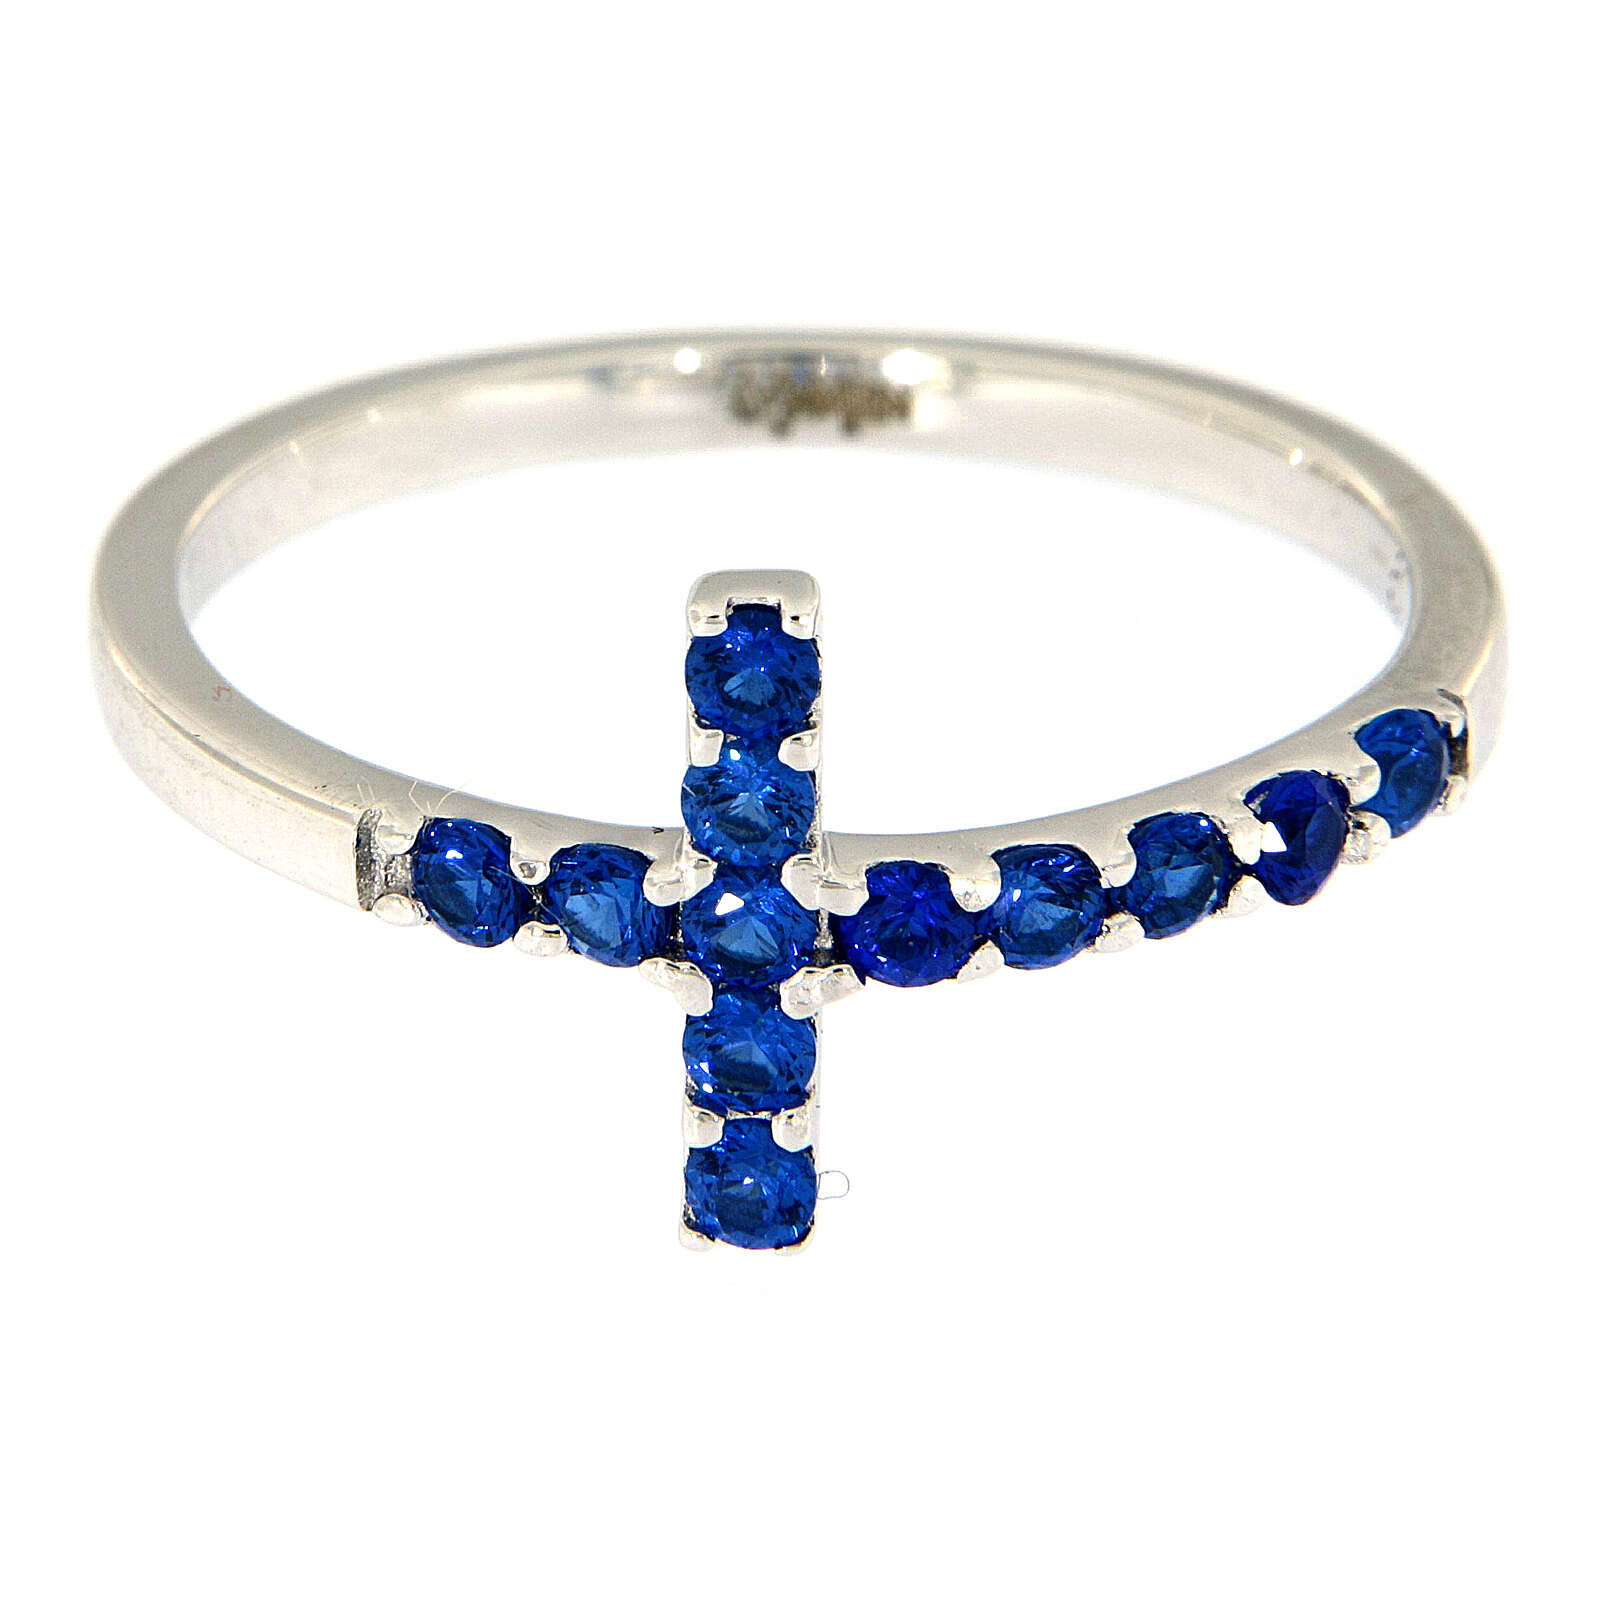 Ring AMEN Silber 925 Kreuz blauen Zirkonen 3